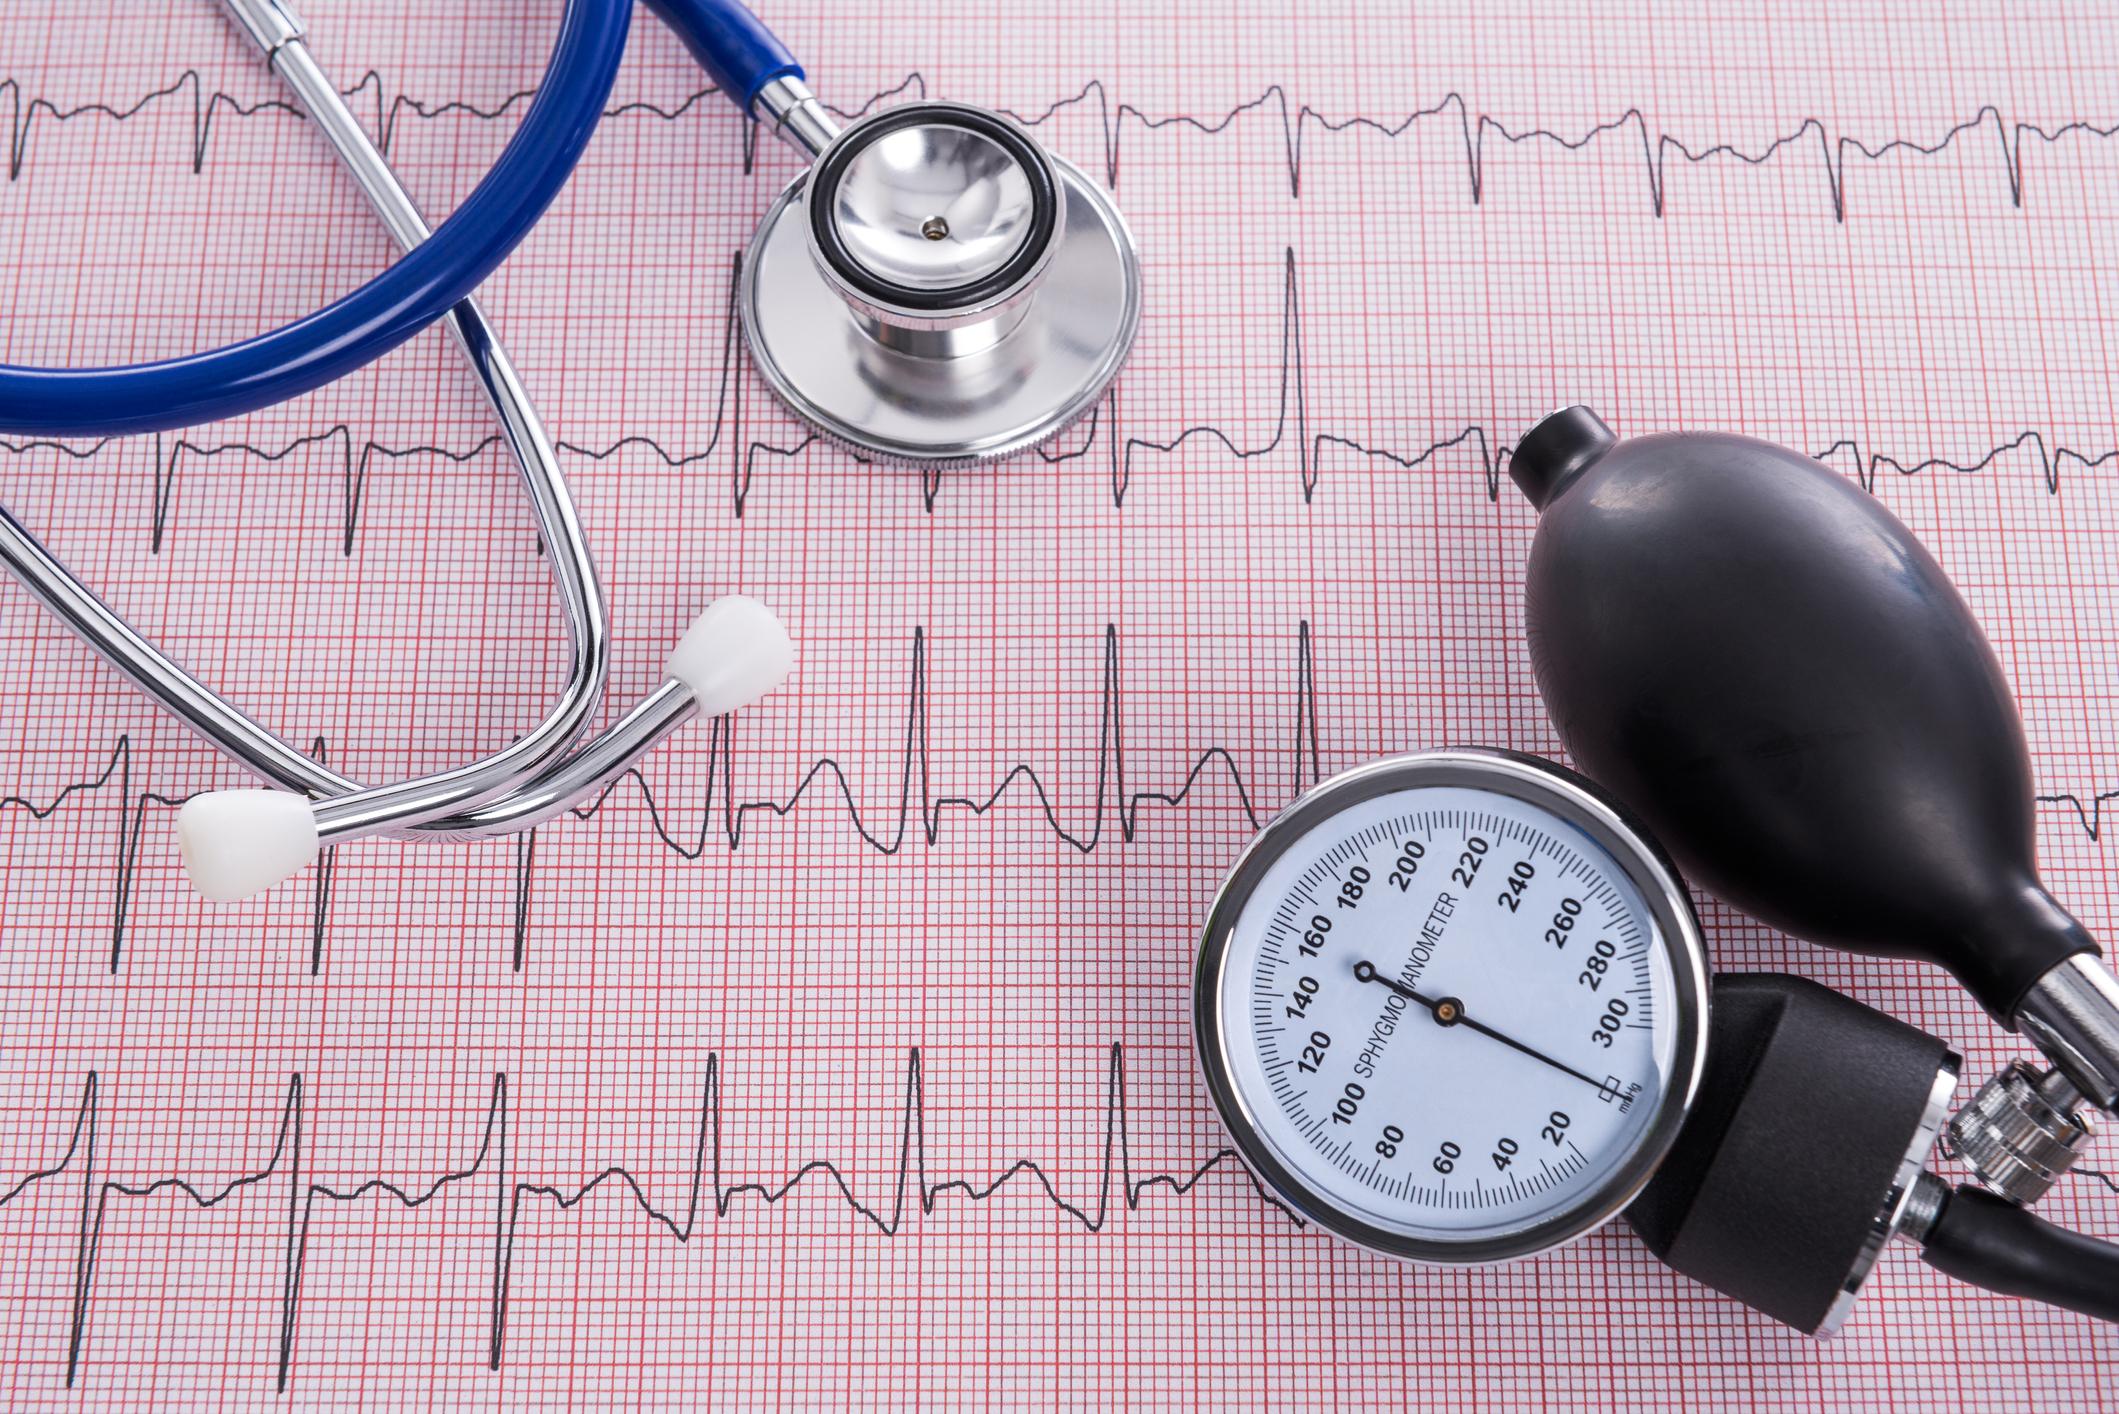 Facharzt Omid Raissi EKG